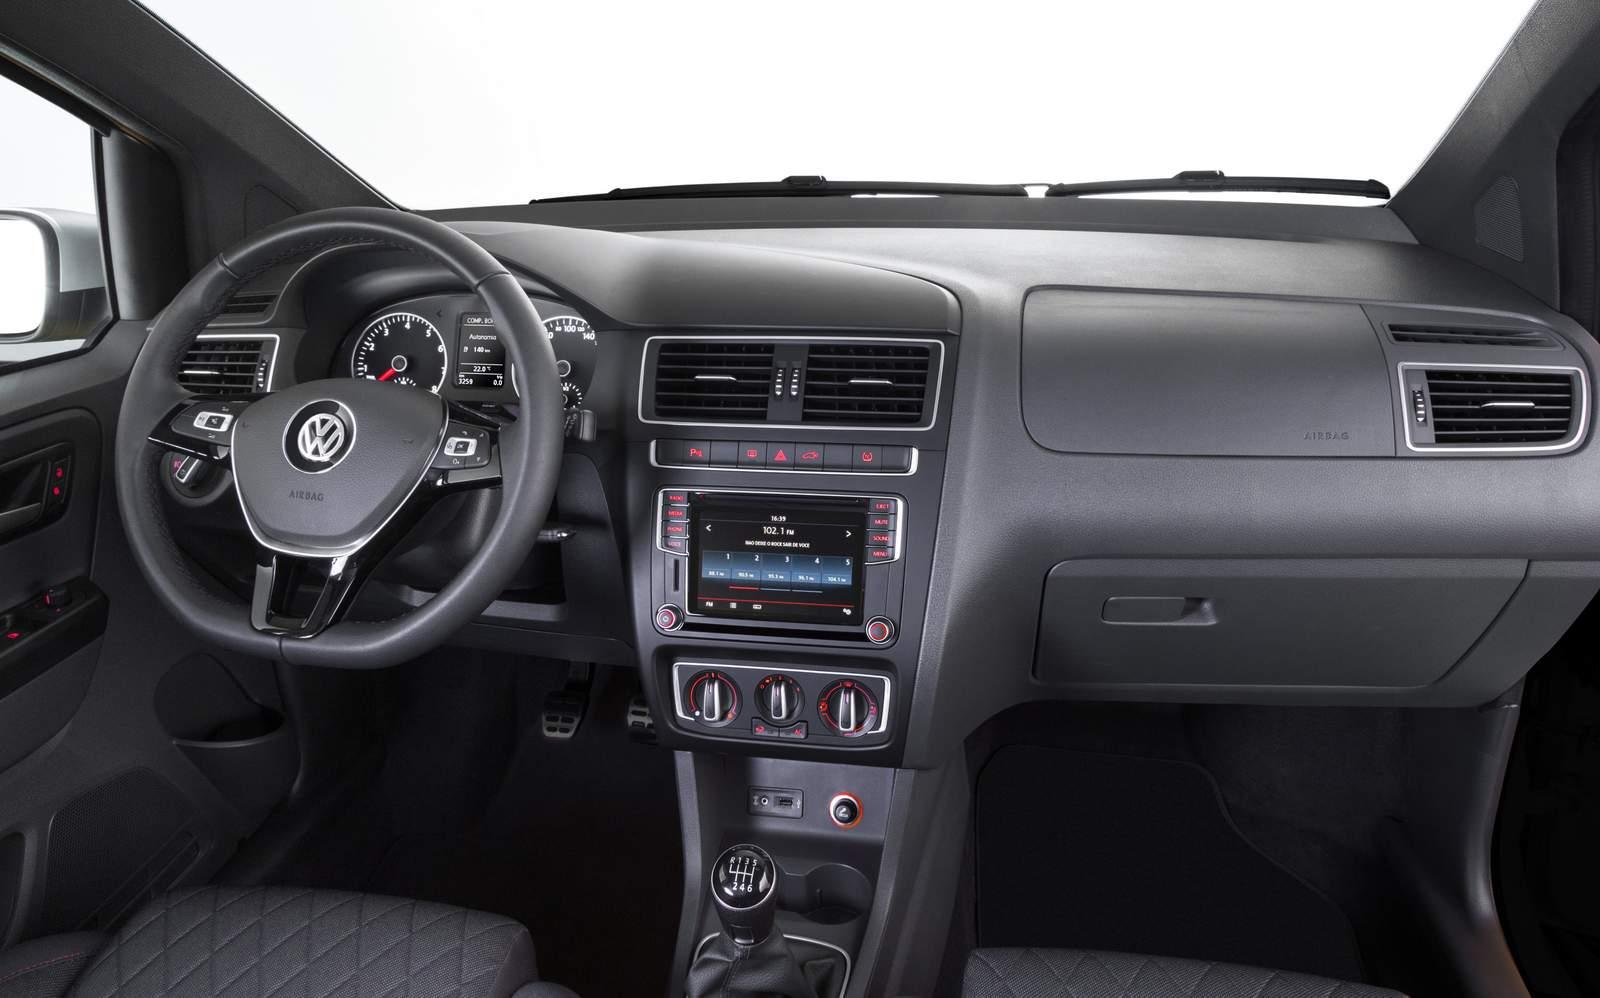 VW Fox 2016 interior